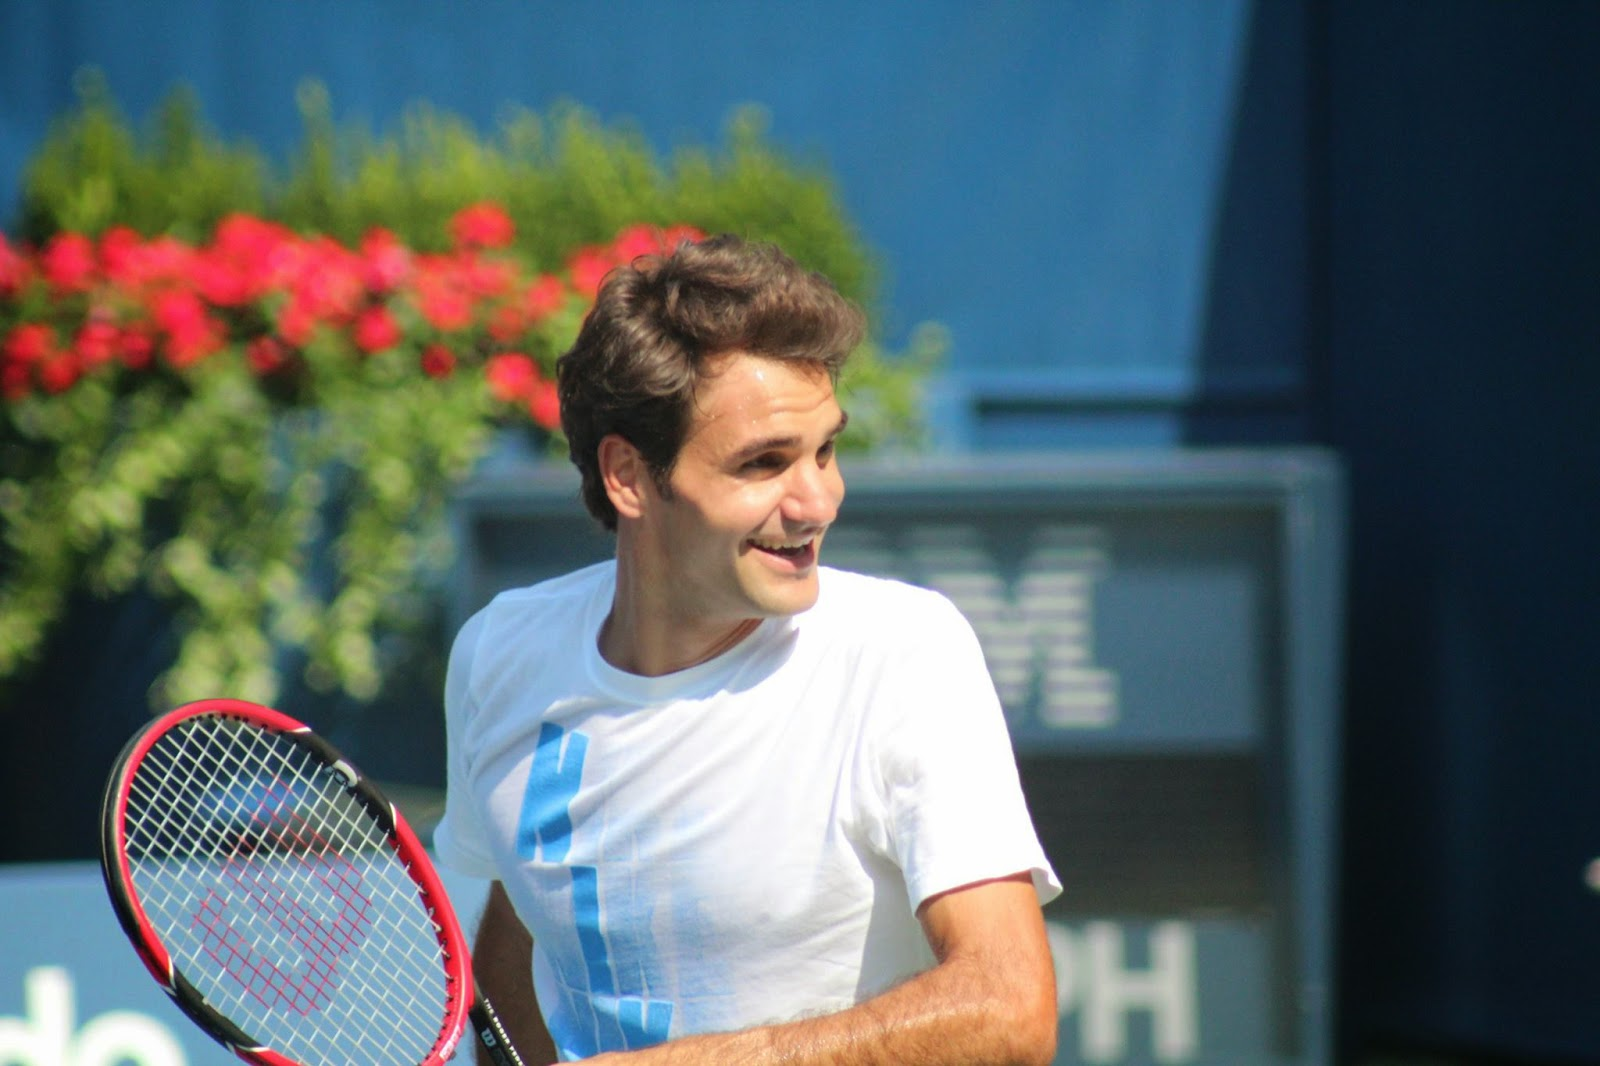 US Open, tenisz, sport, Roger Federer, Novak Djokovic, Rafael Nadal, Serena Williams, Simona Halep, Maria Sharapova,